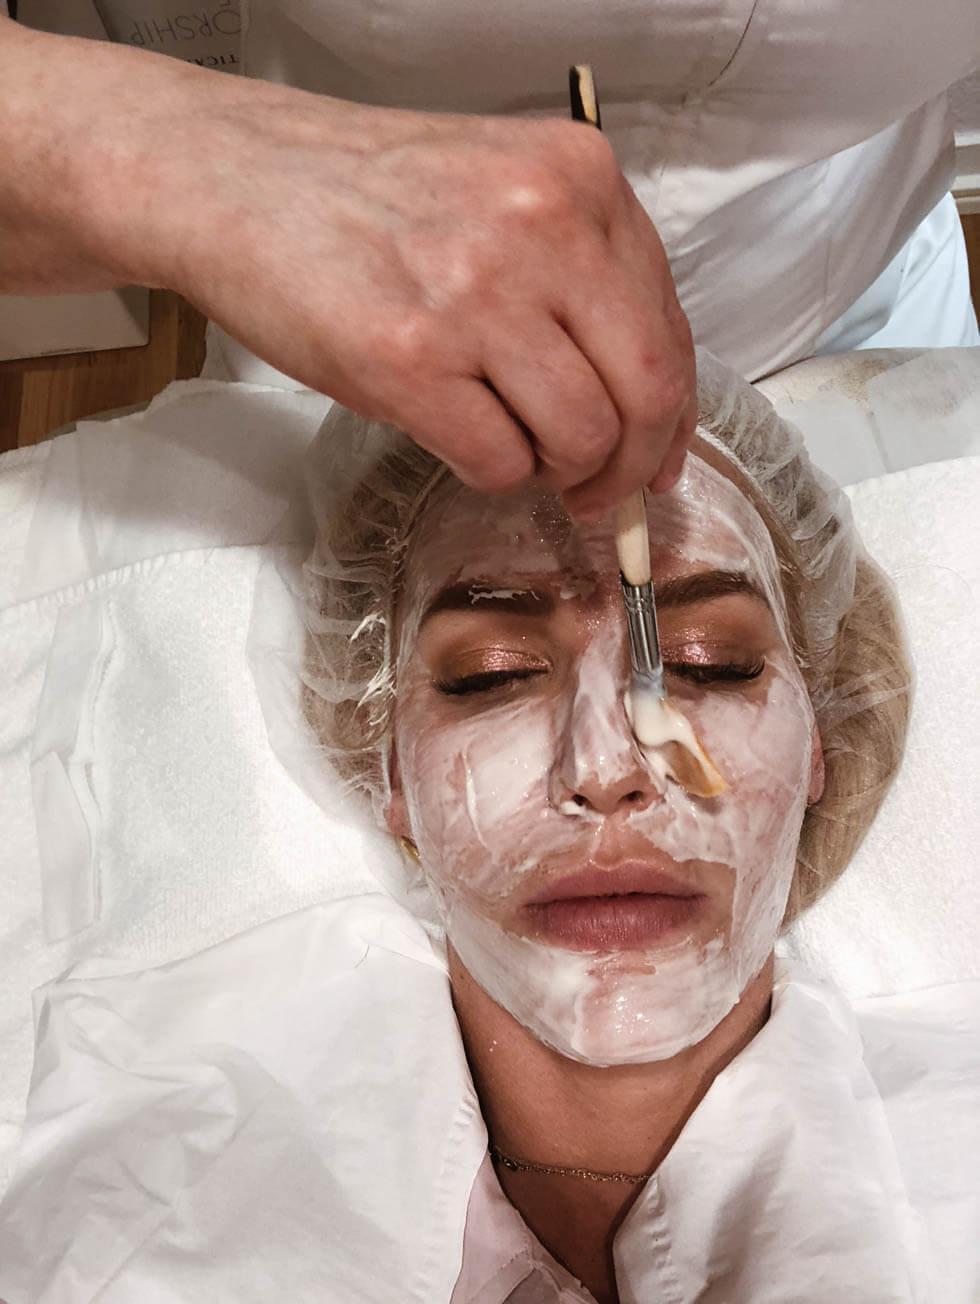 Microdermabrasion- Finslipa huden, damsug och bli kvitt grova porer._-13